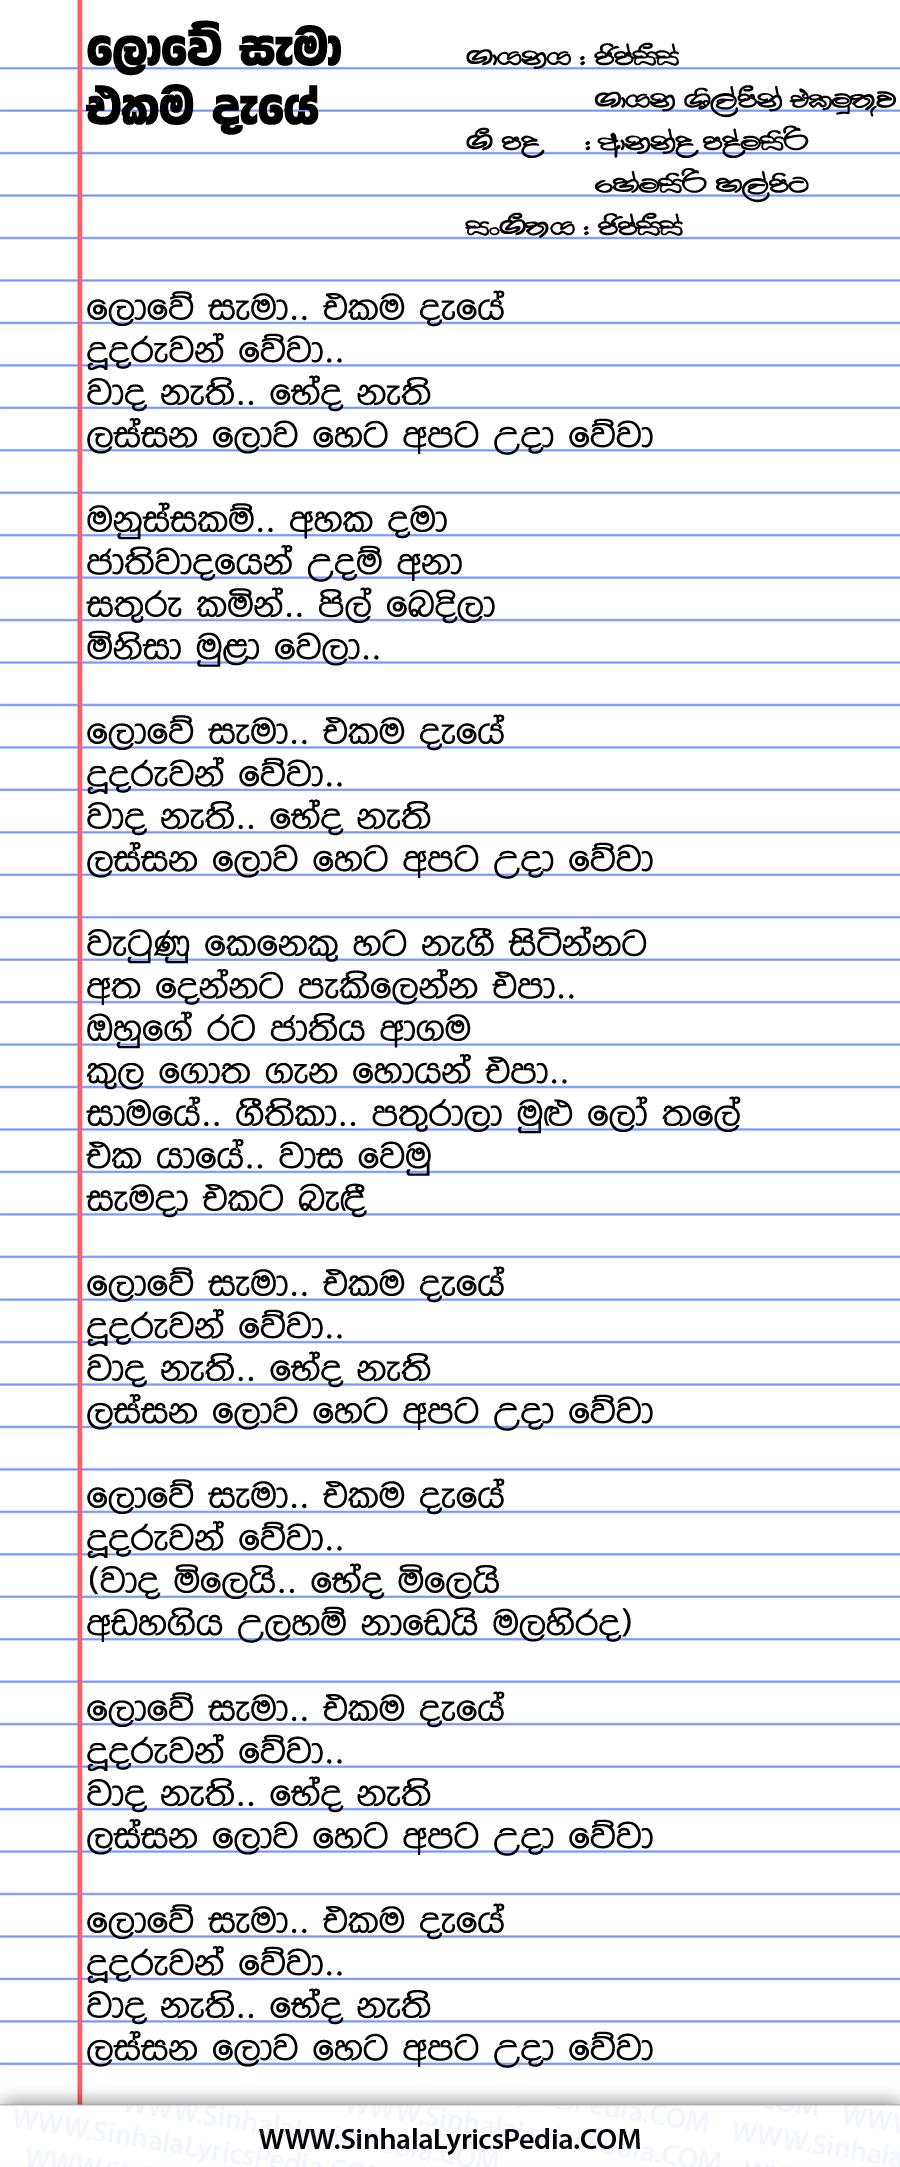 Lowe Sama Ekama Daye Song Lyrics